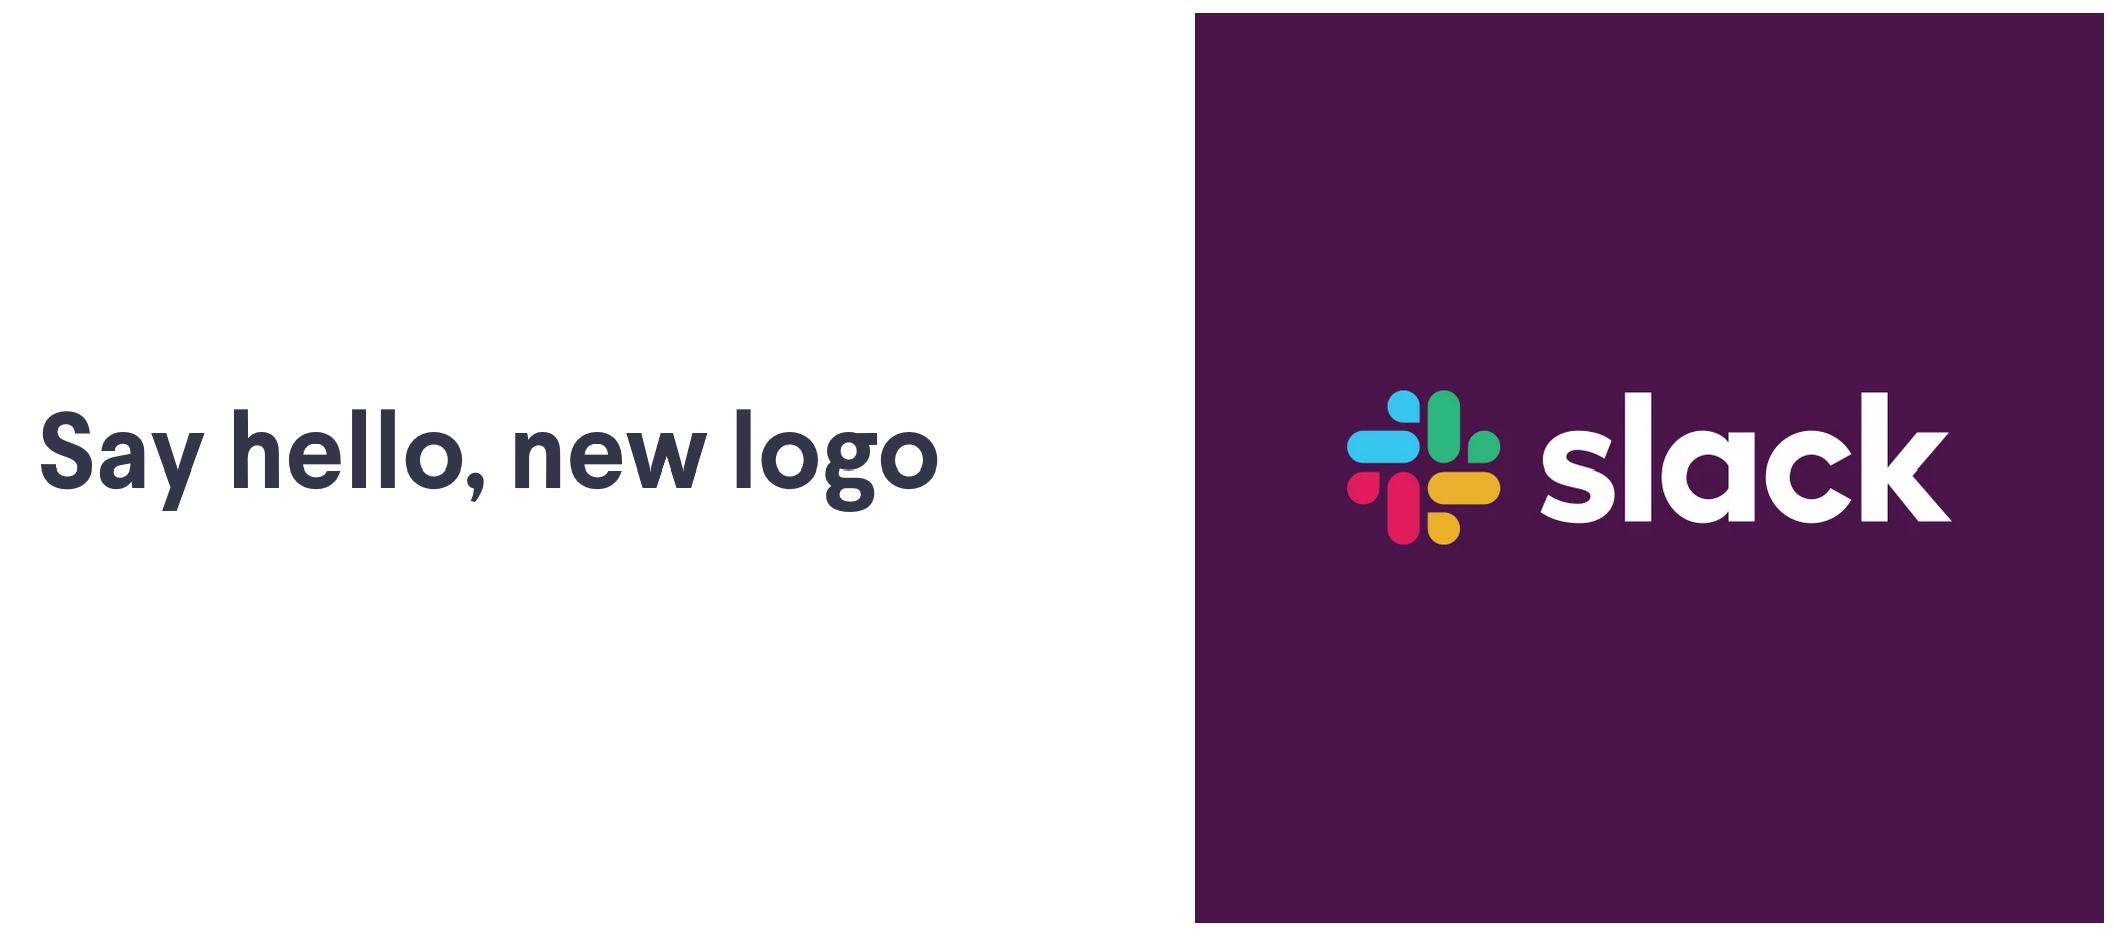 Slack nowe logo